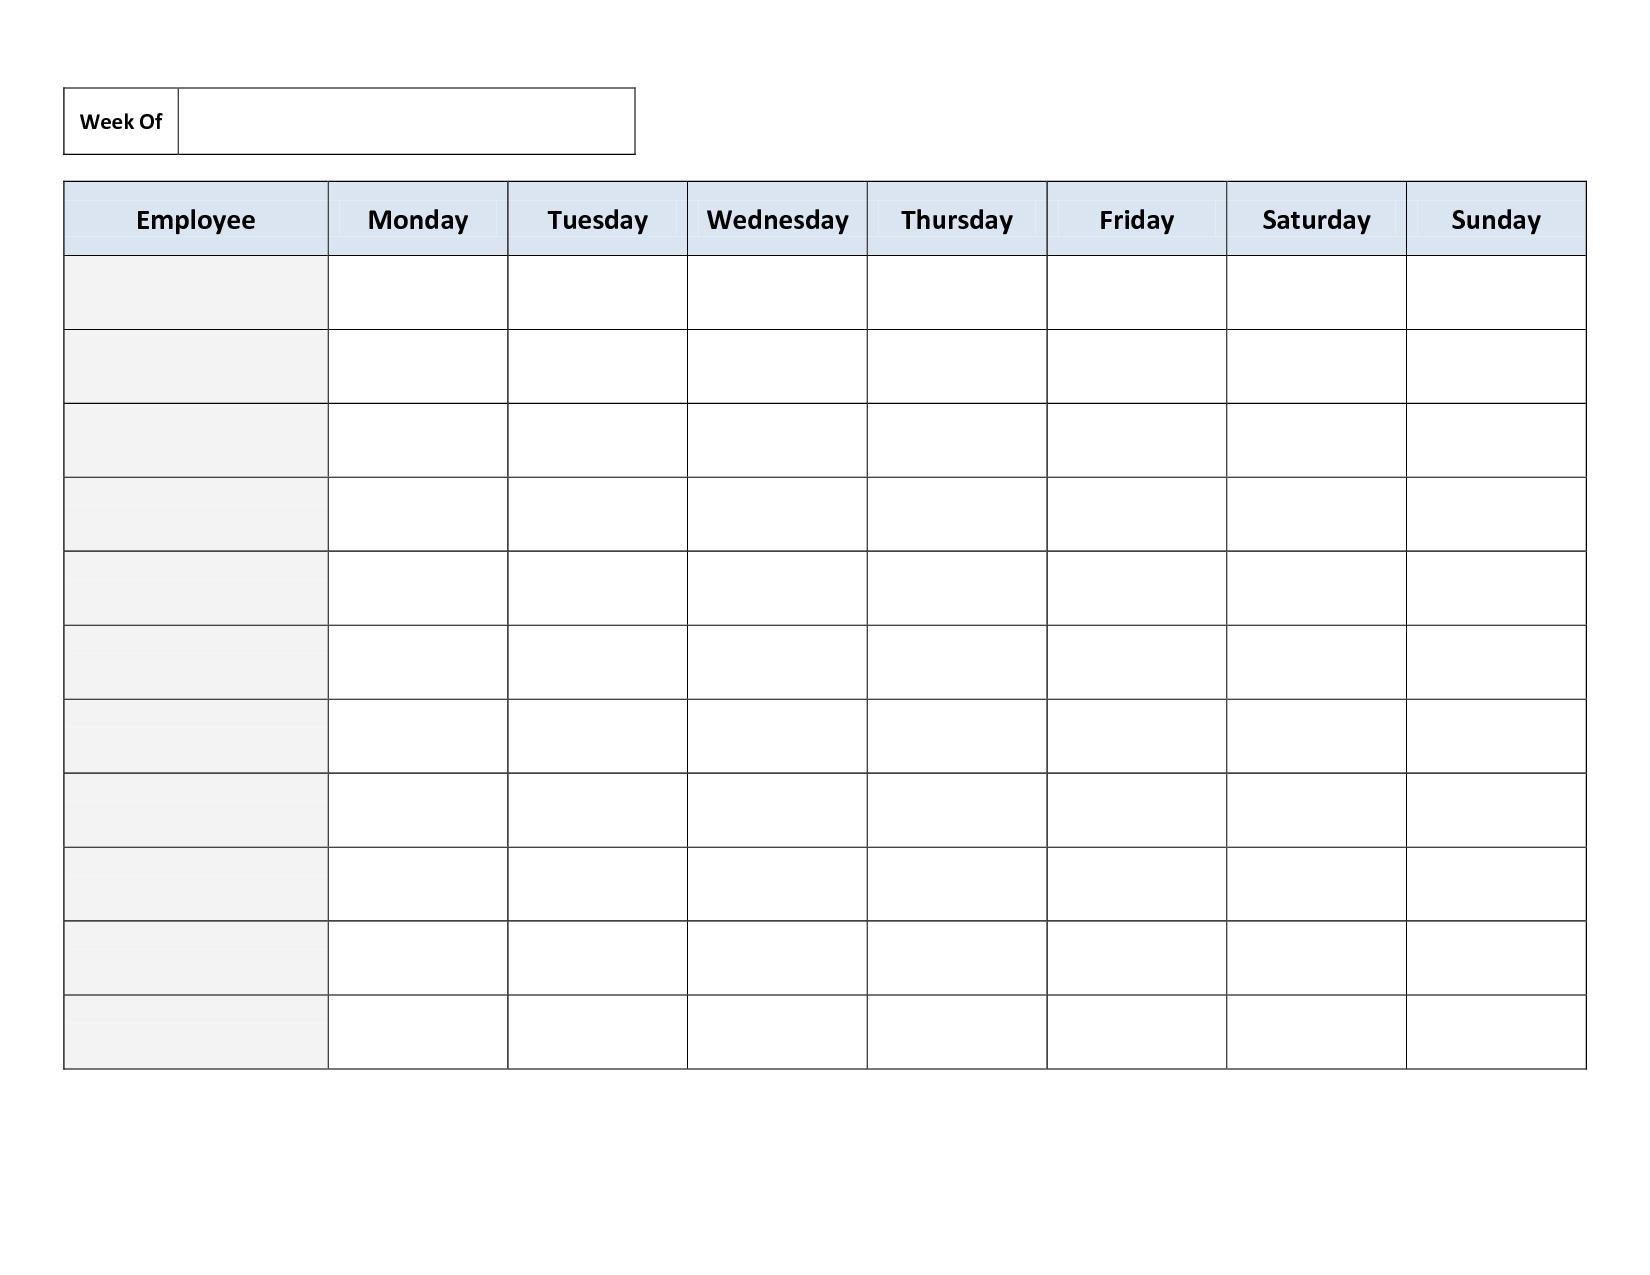 Weekly Employee Work Schedule Template. Free Blank Schedule.pdf - Free Printable Blank Work Schedules